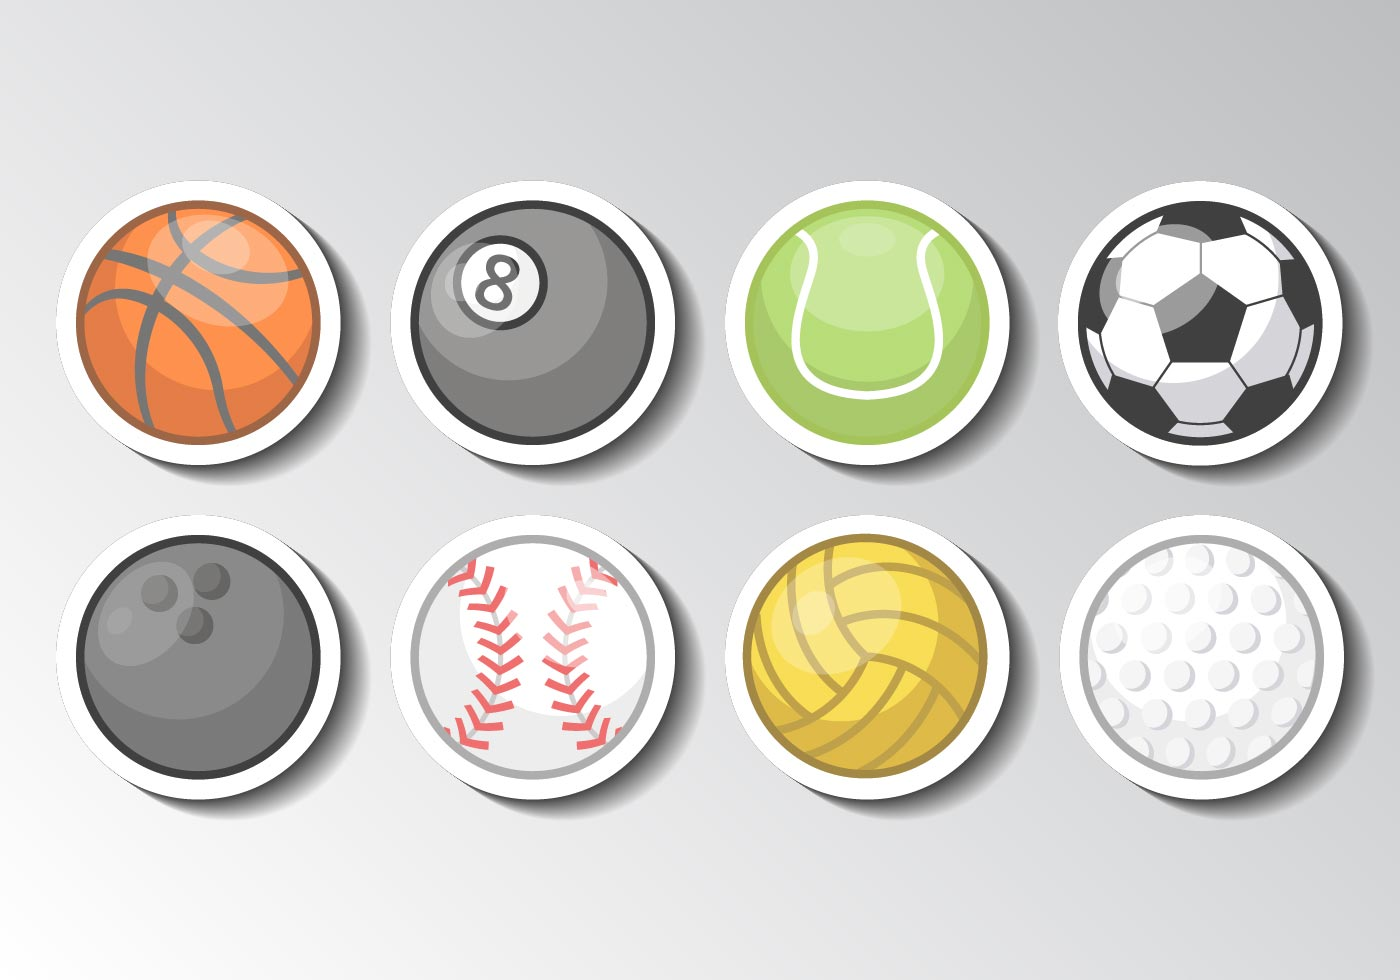 sports vector ball vectors icons sport graphics icon edit clipart softball baseball golf non volleyball game vecteezy